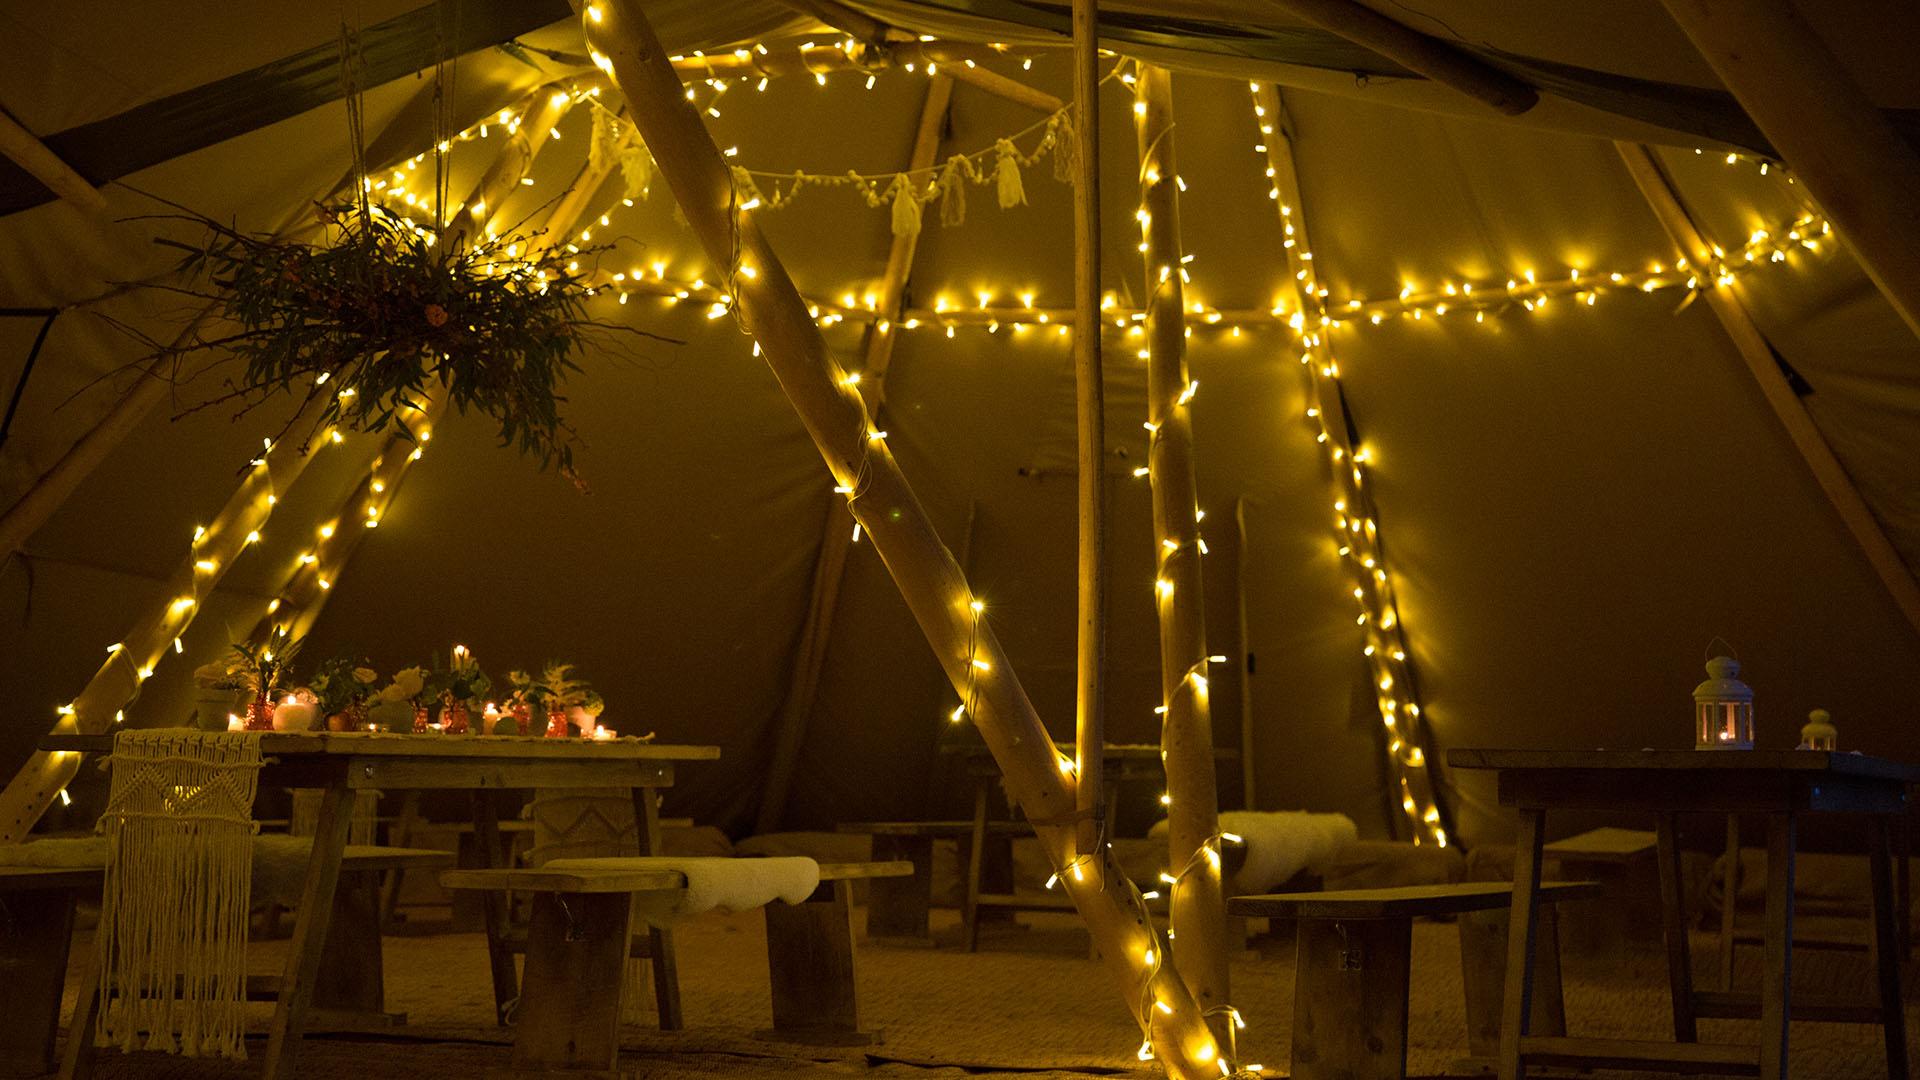 Tipi at Night - Outdoor Wedding Venue at The Orchard at Munsley